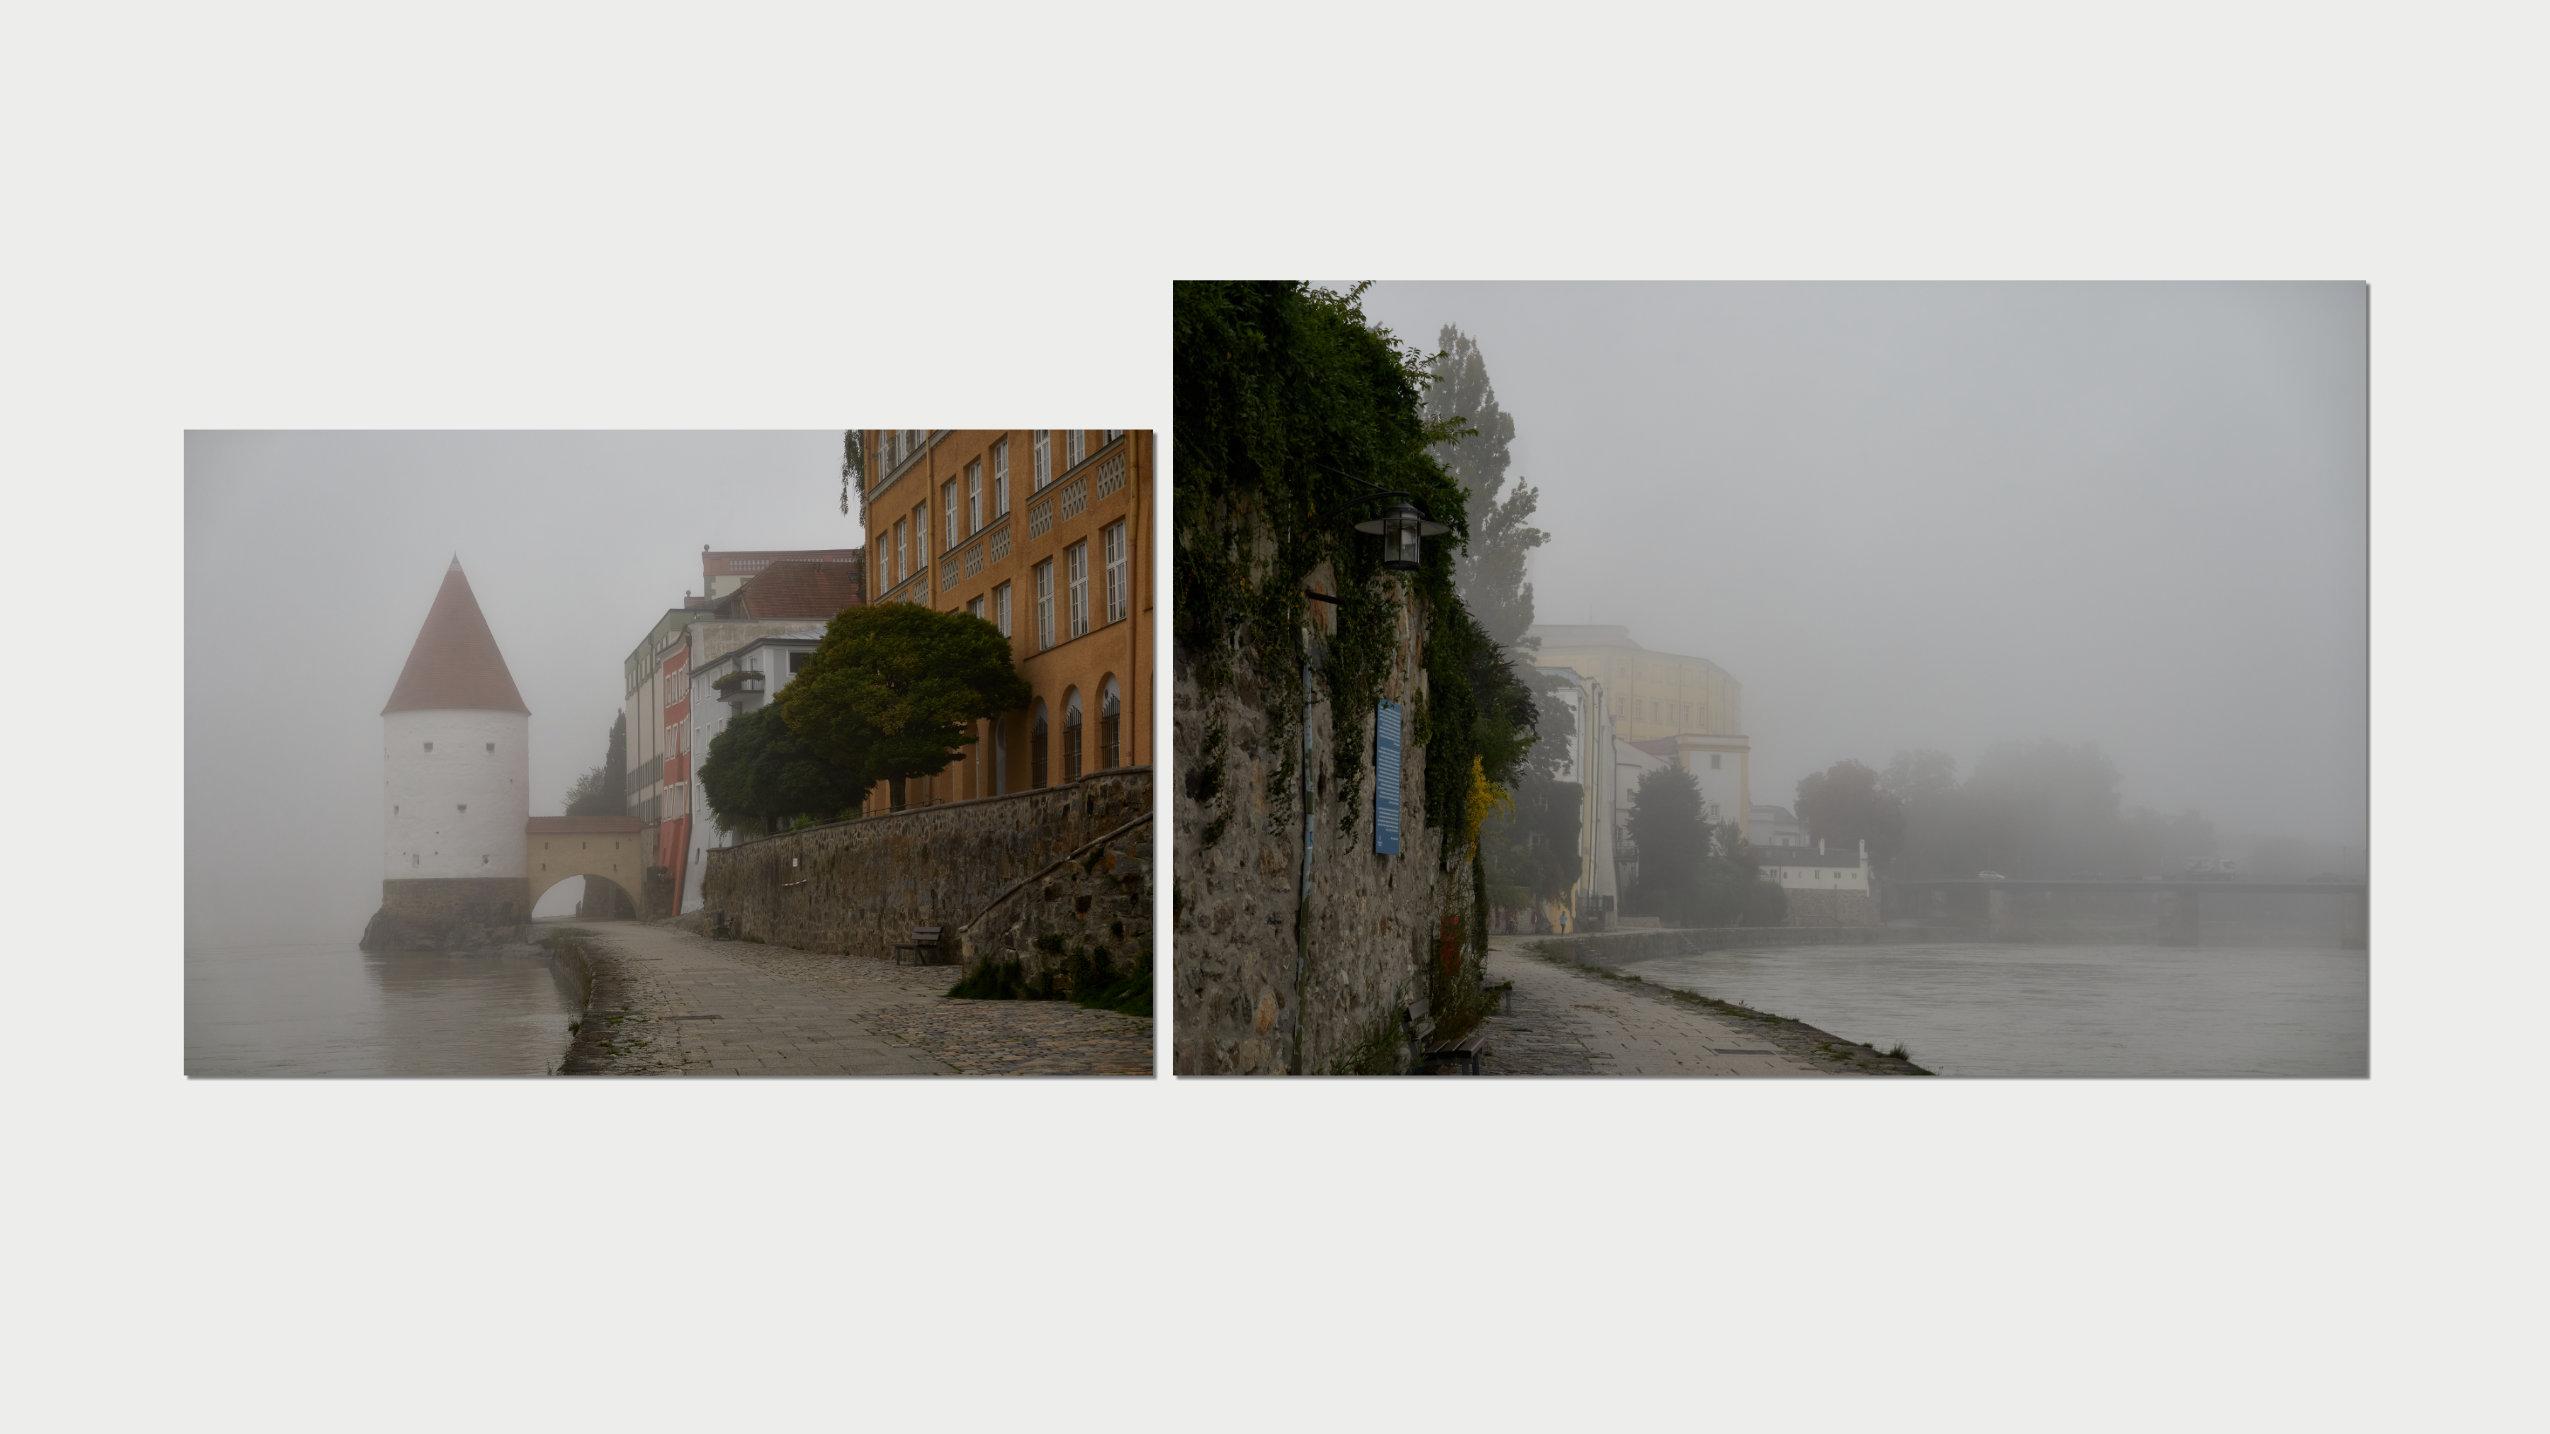 Donaunotizen - virtual show